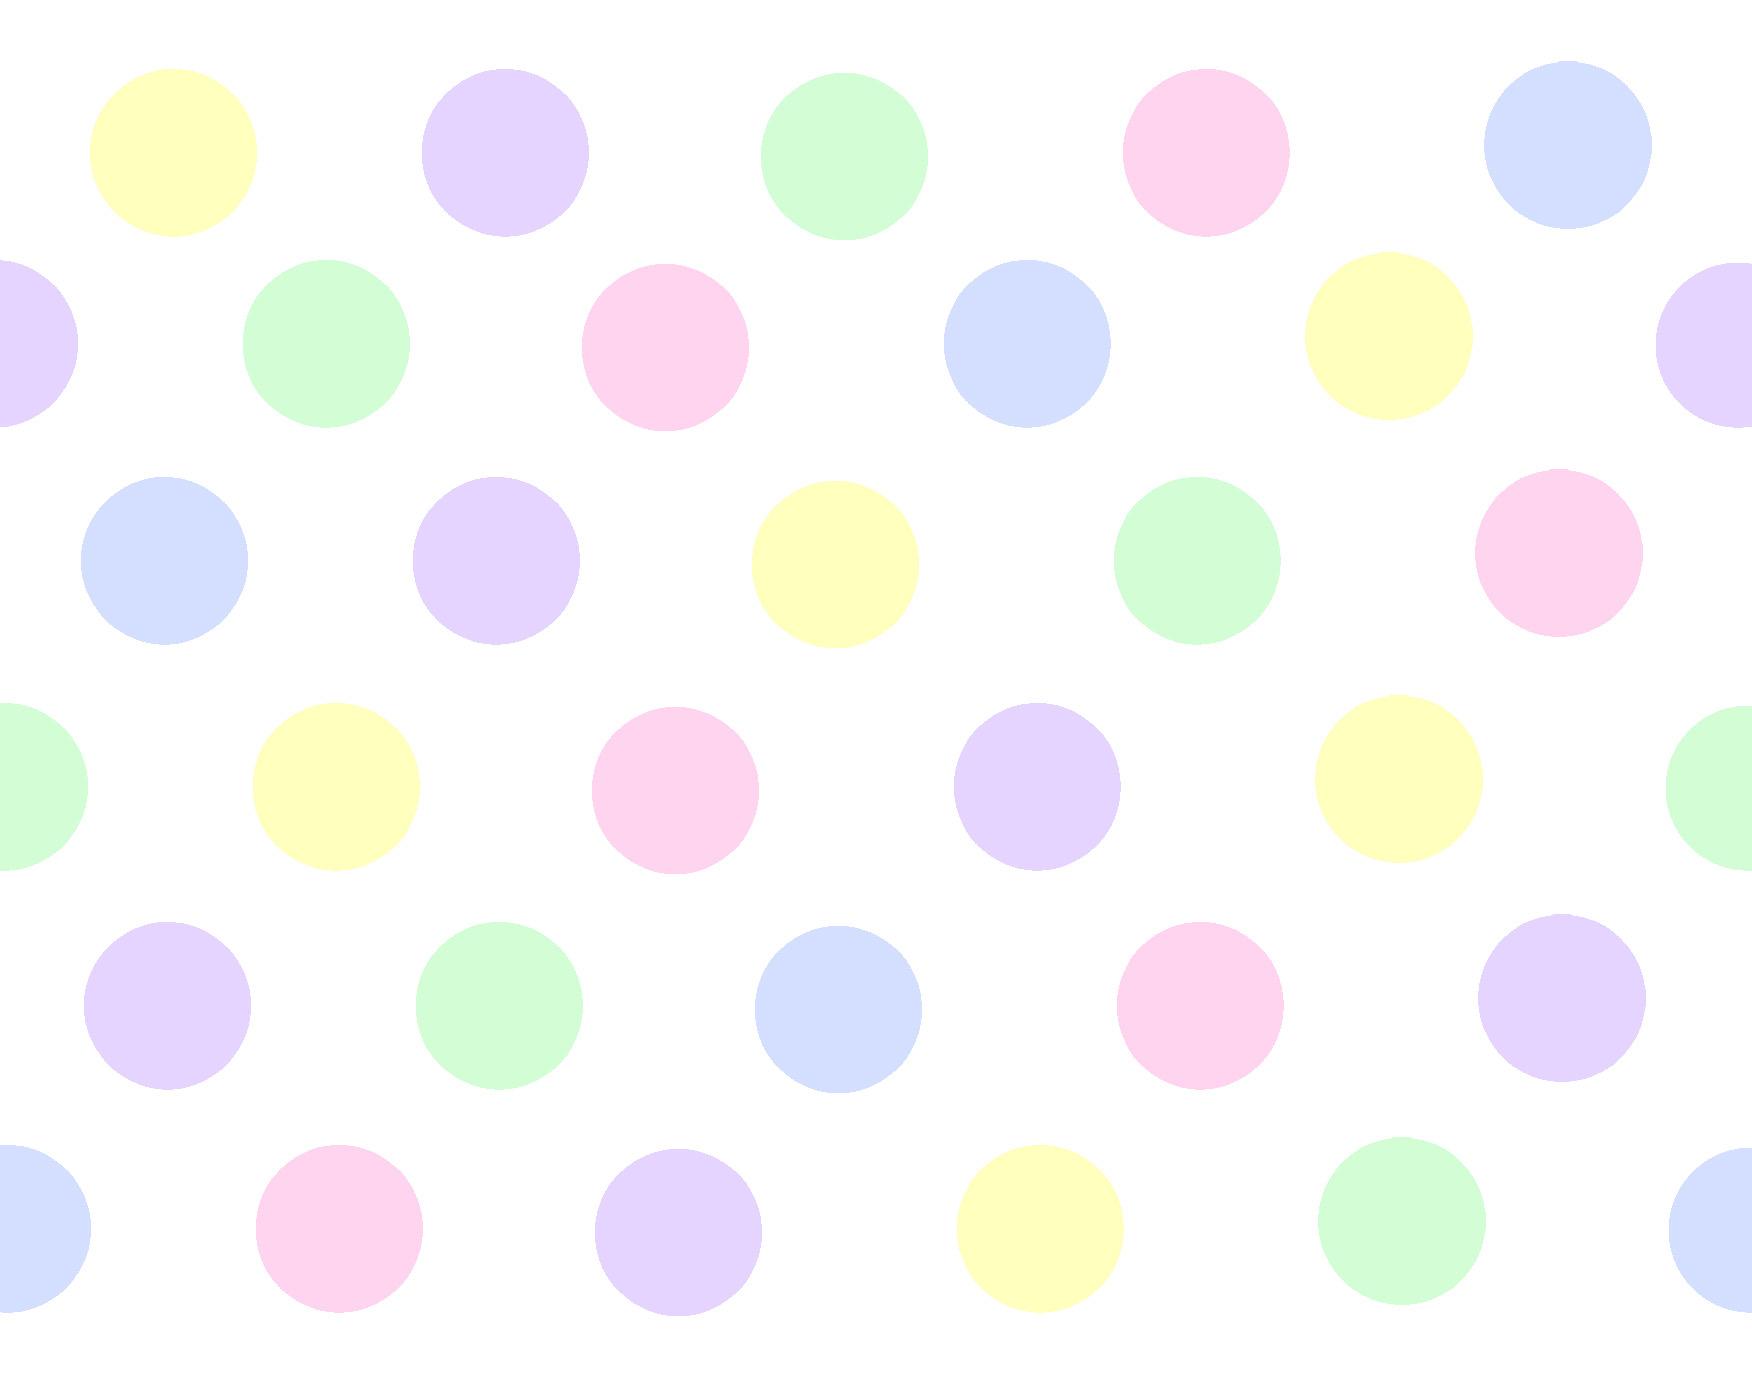 Polka Dot Wallpapers - WallpaperSafari